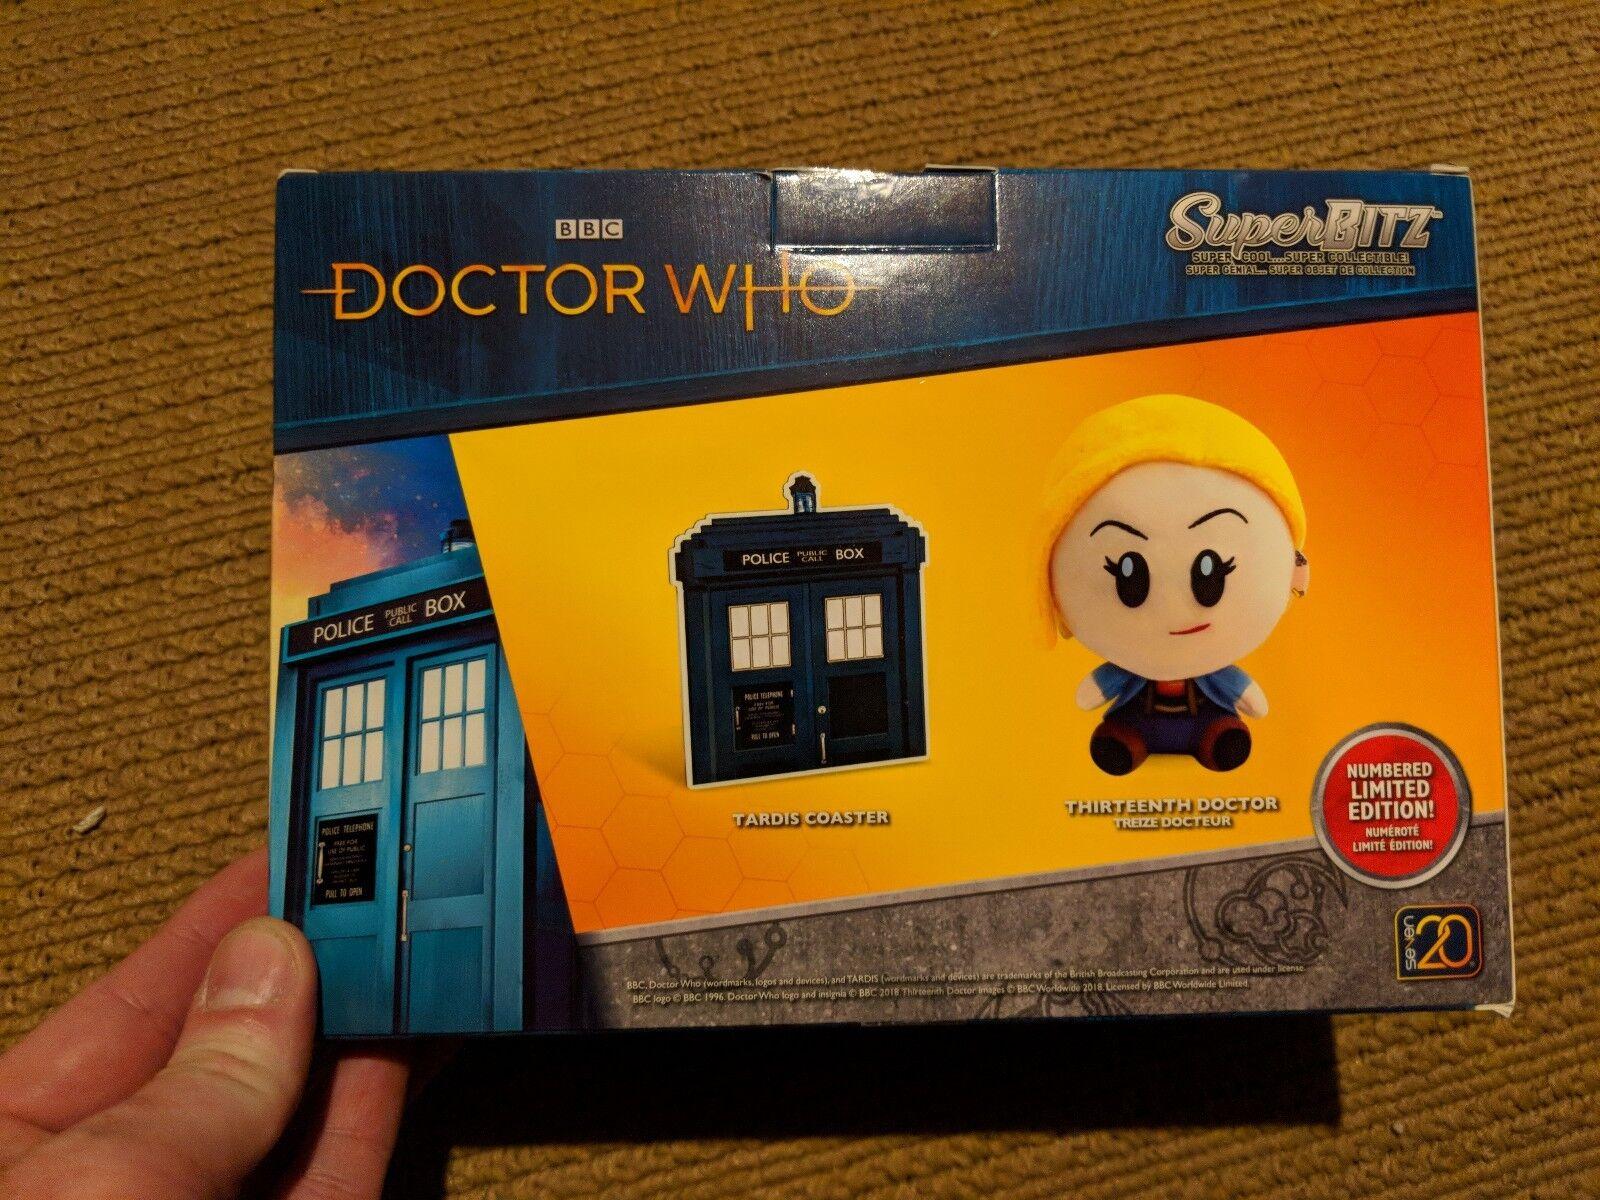 SDCC 2018 Exclusive Superbitz Thirteenth Thirteenth Thirteenth Doctor & Coaster Dr Who 13th Dr LE 5500 0a4e81